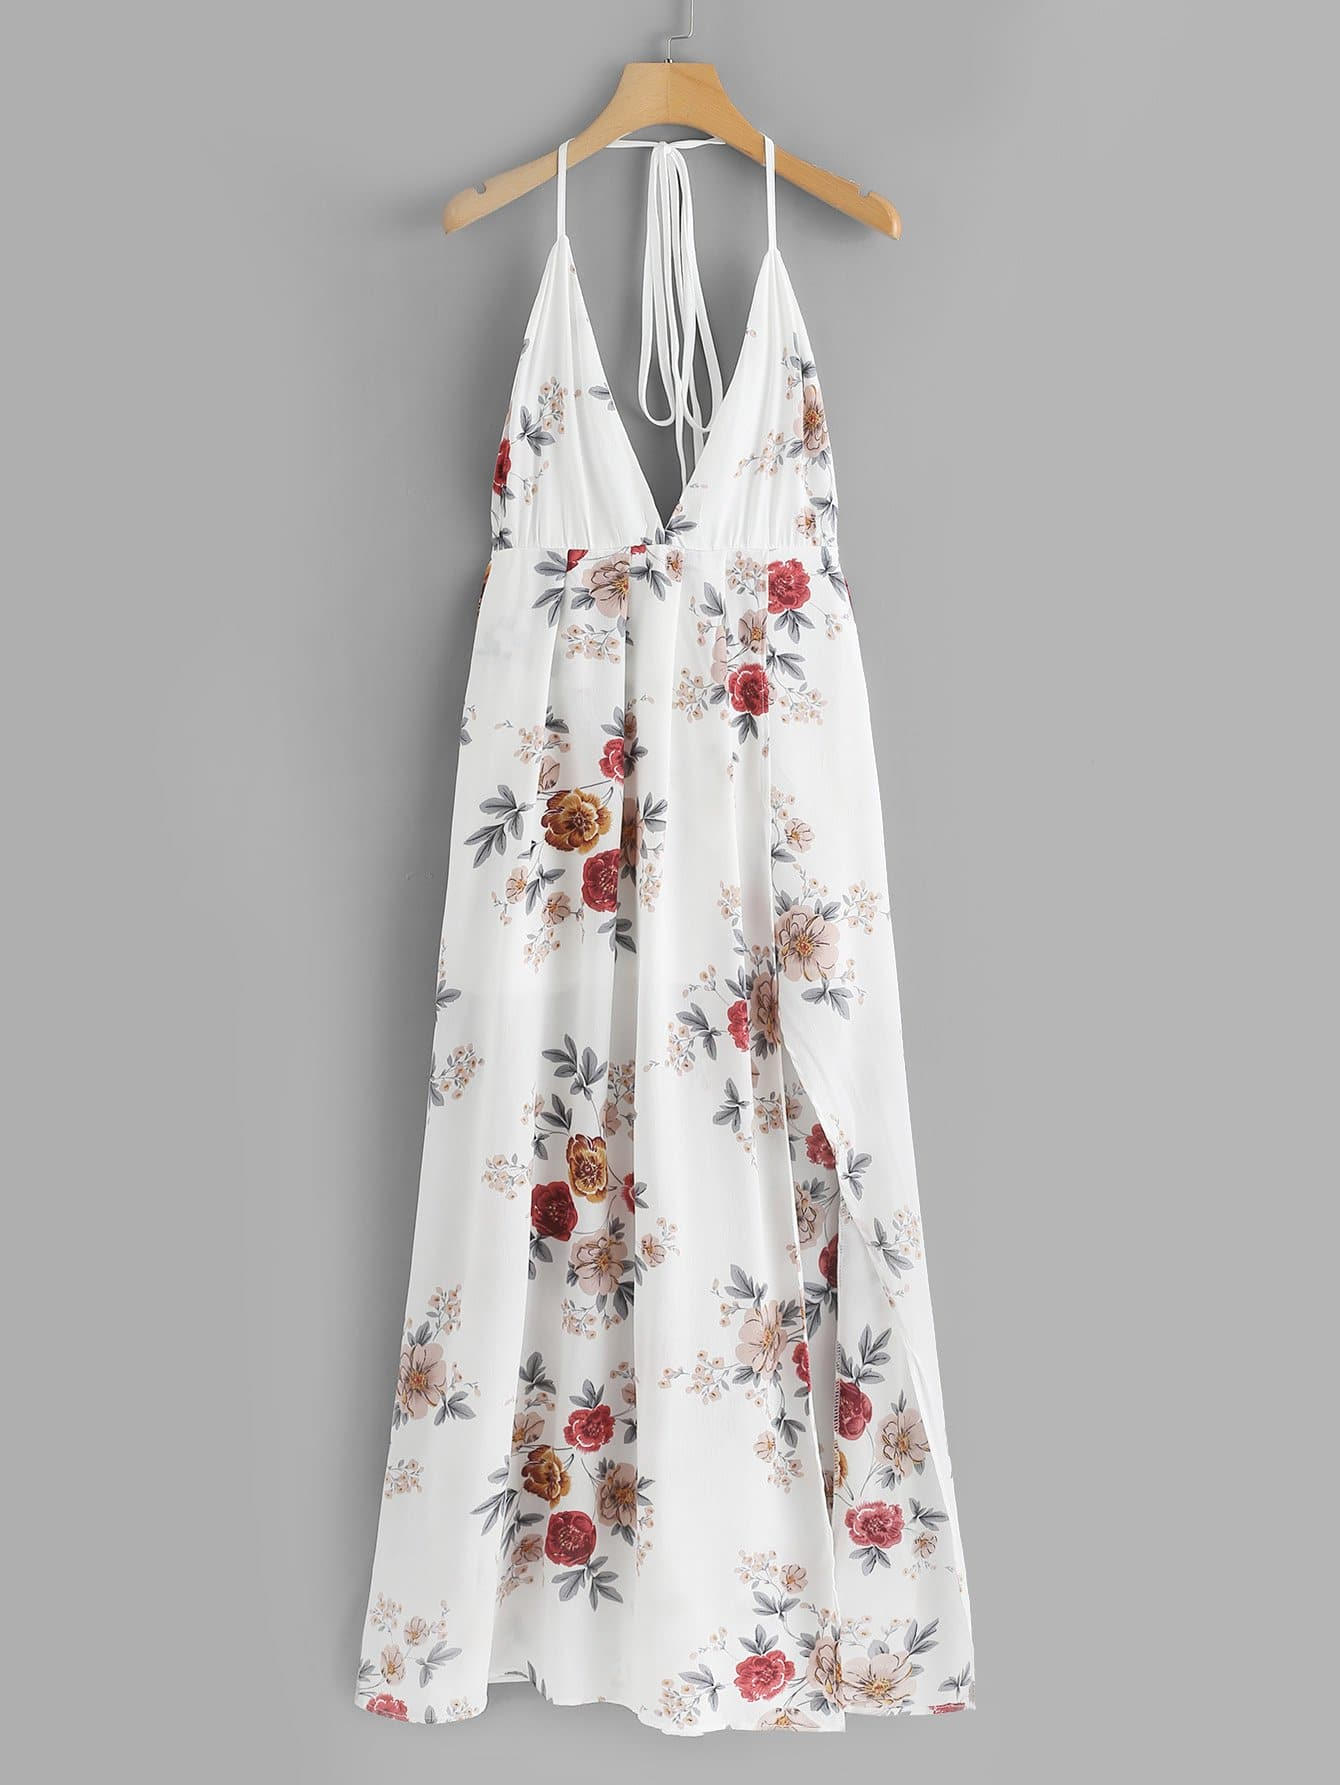 Floral Print Criss Cross Back Dress